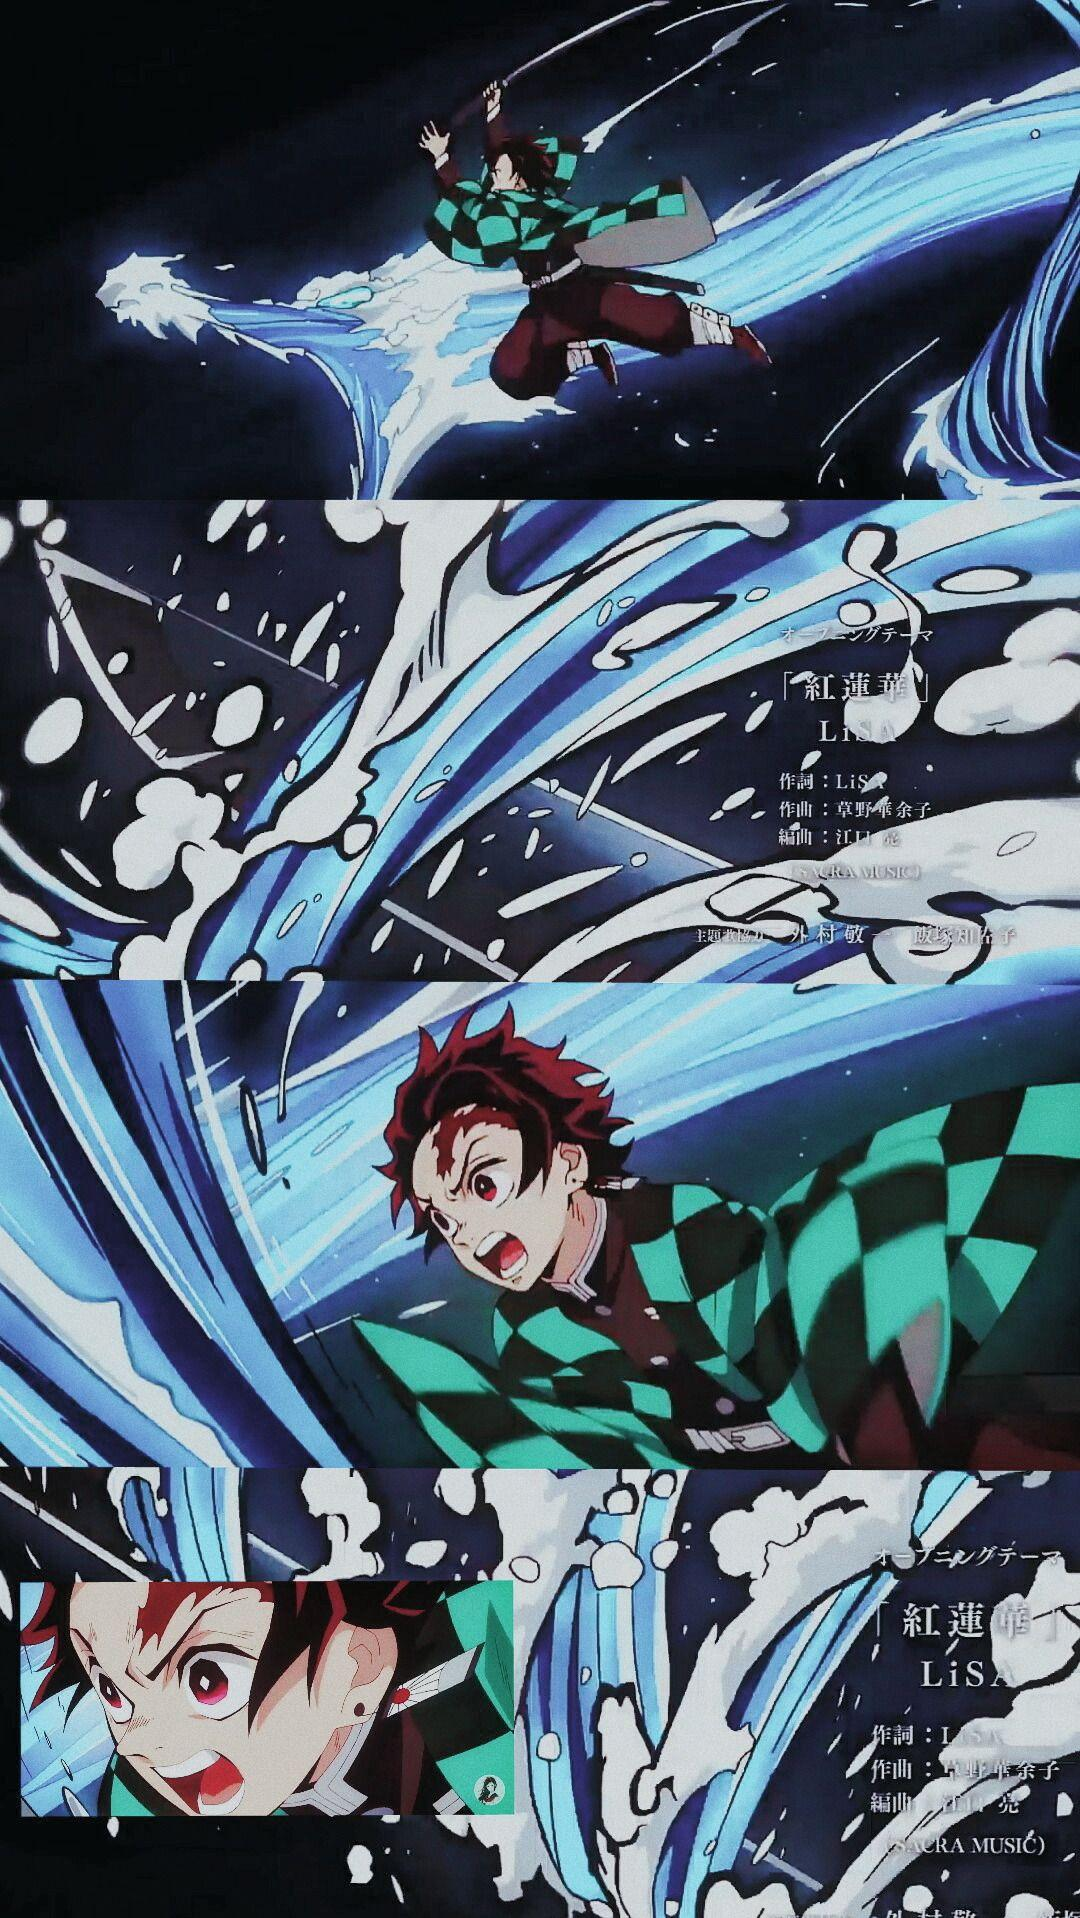 Demon Slayer Kimetsu No Yaiba Wallpapers Wallpaper Cave